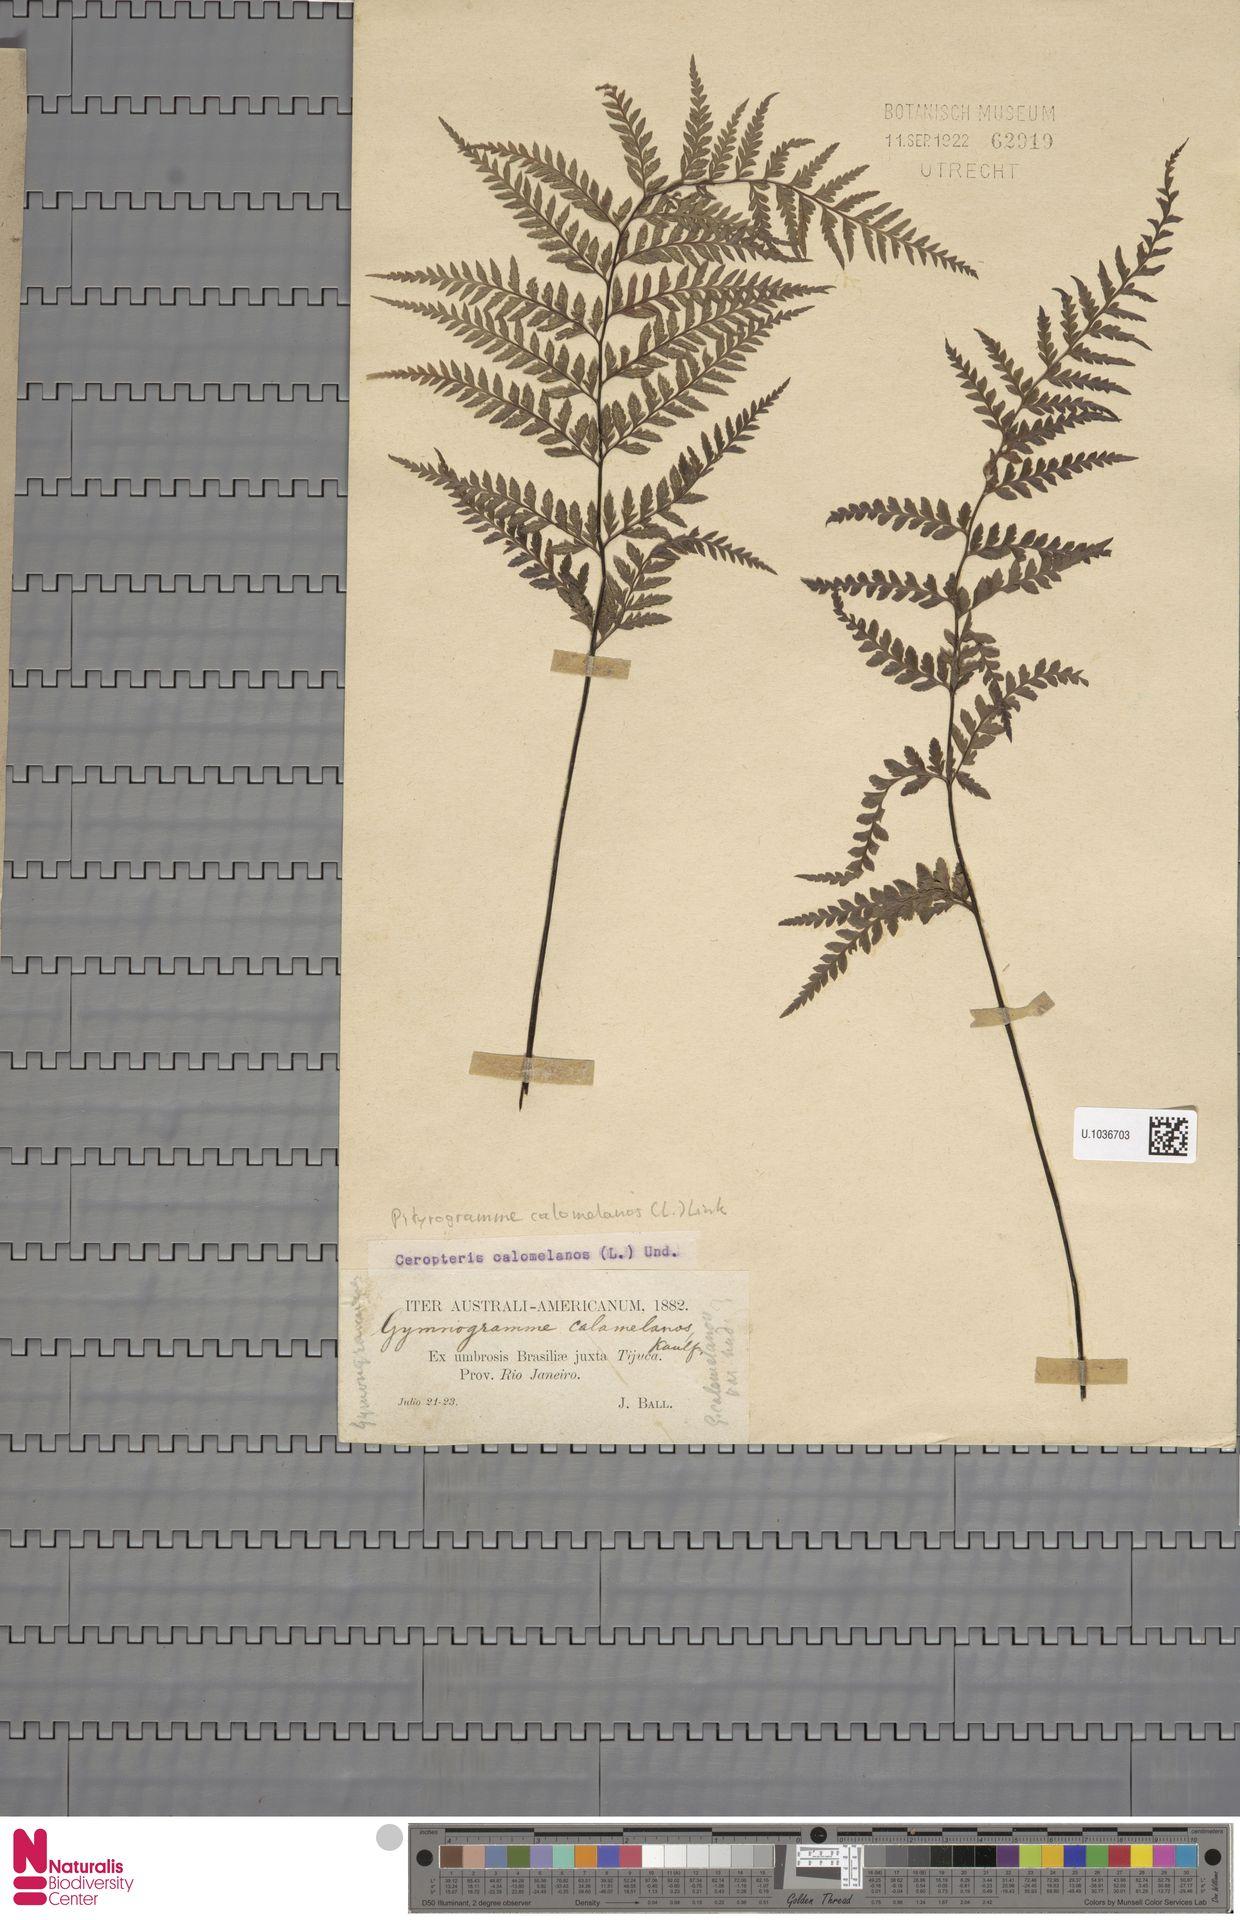 U.1036703 | Pityrogramma calomelanos (L.) Link